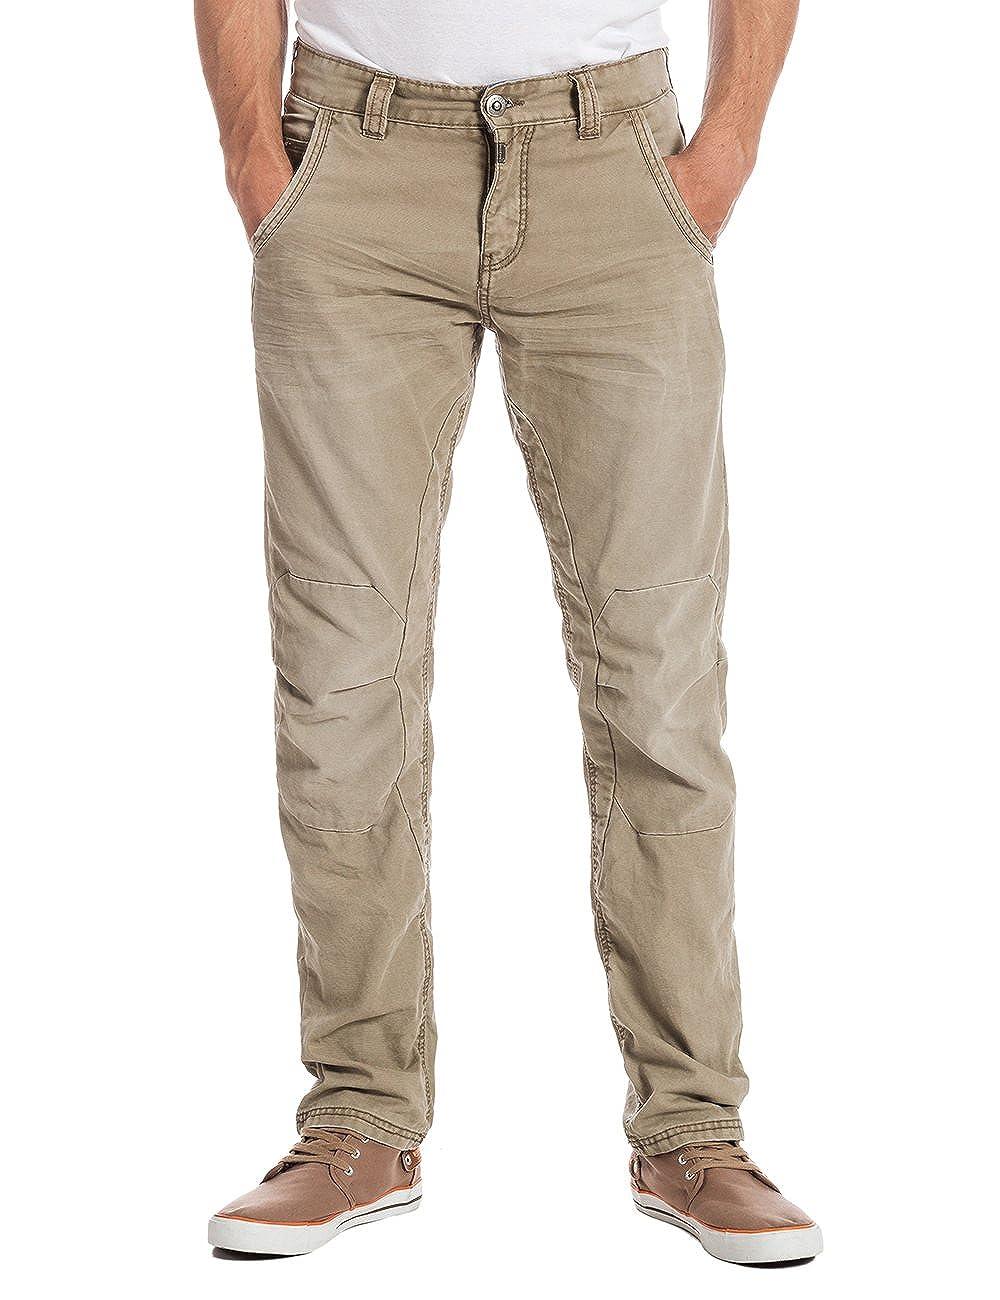 TALLA 28W / 32L. Timezone ChesterTZ Worker Pants-Pantalones Hombre,